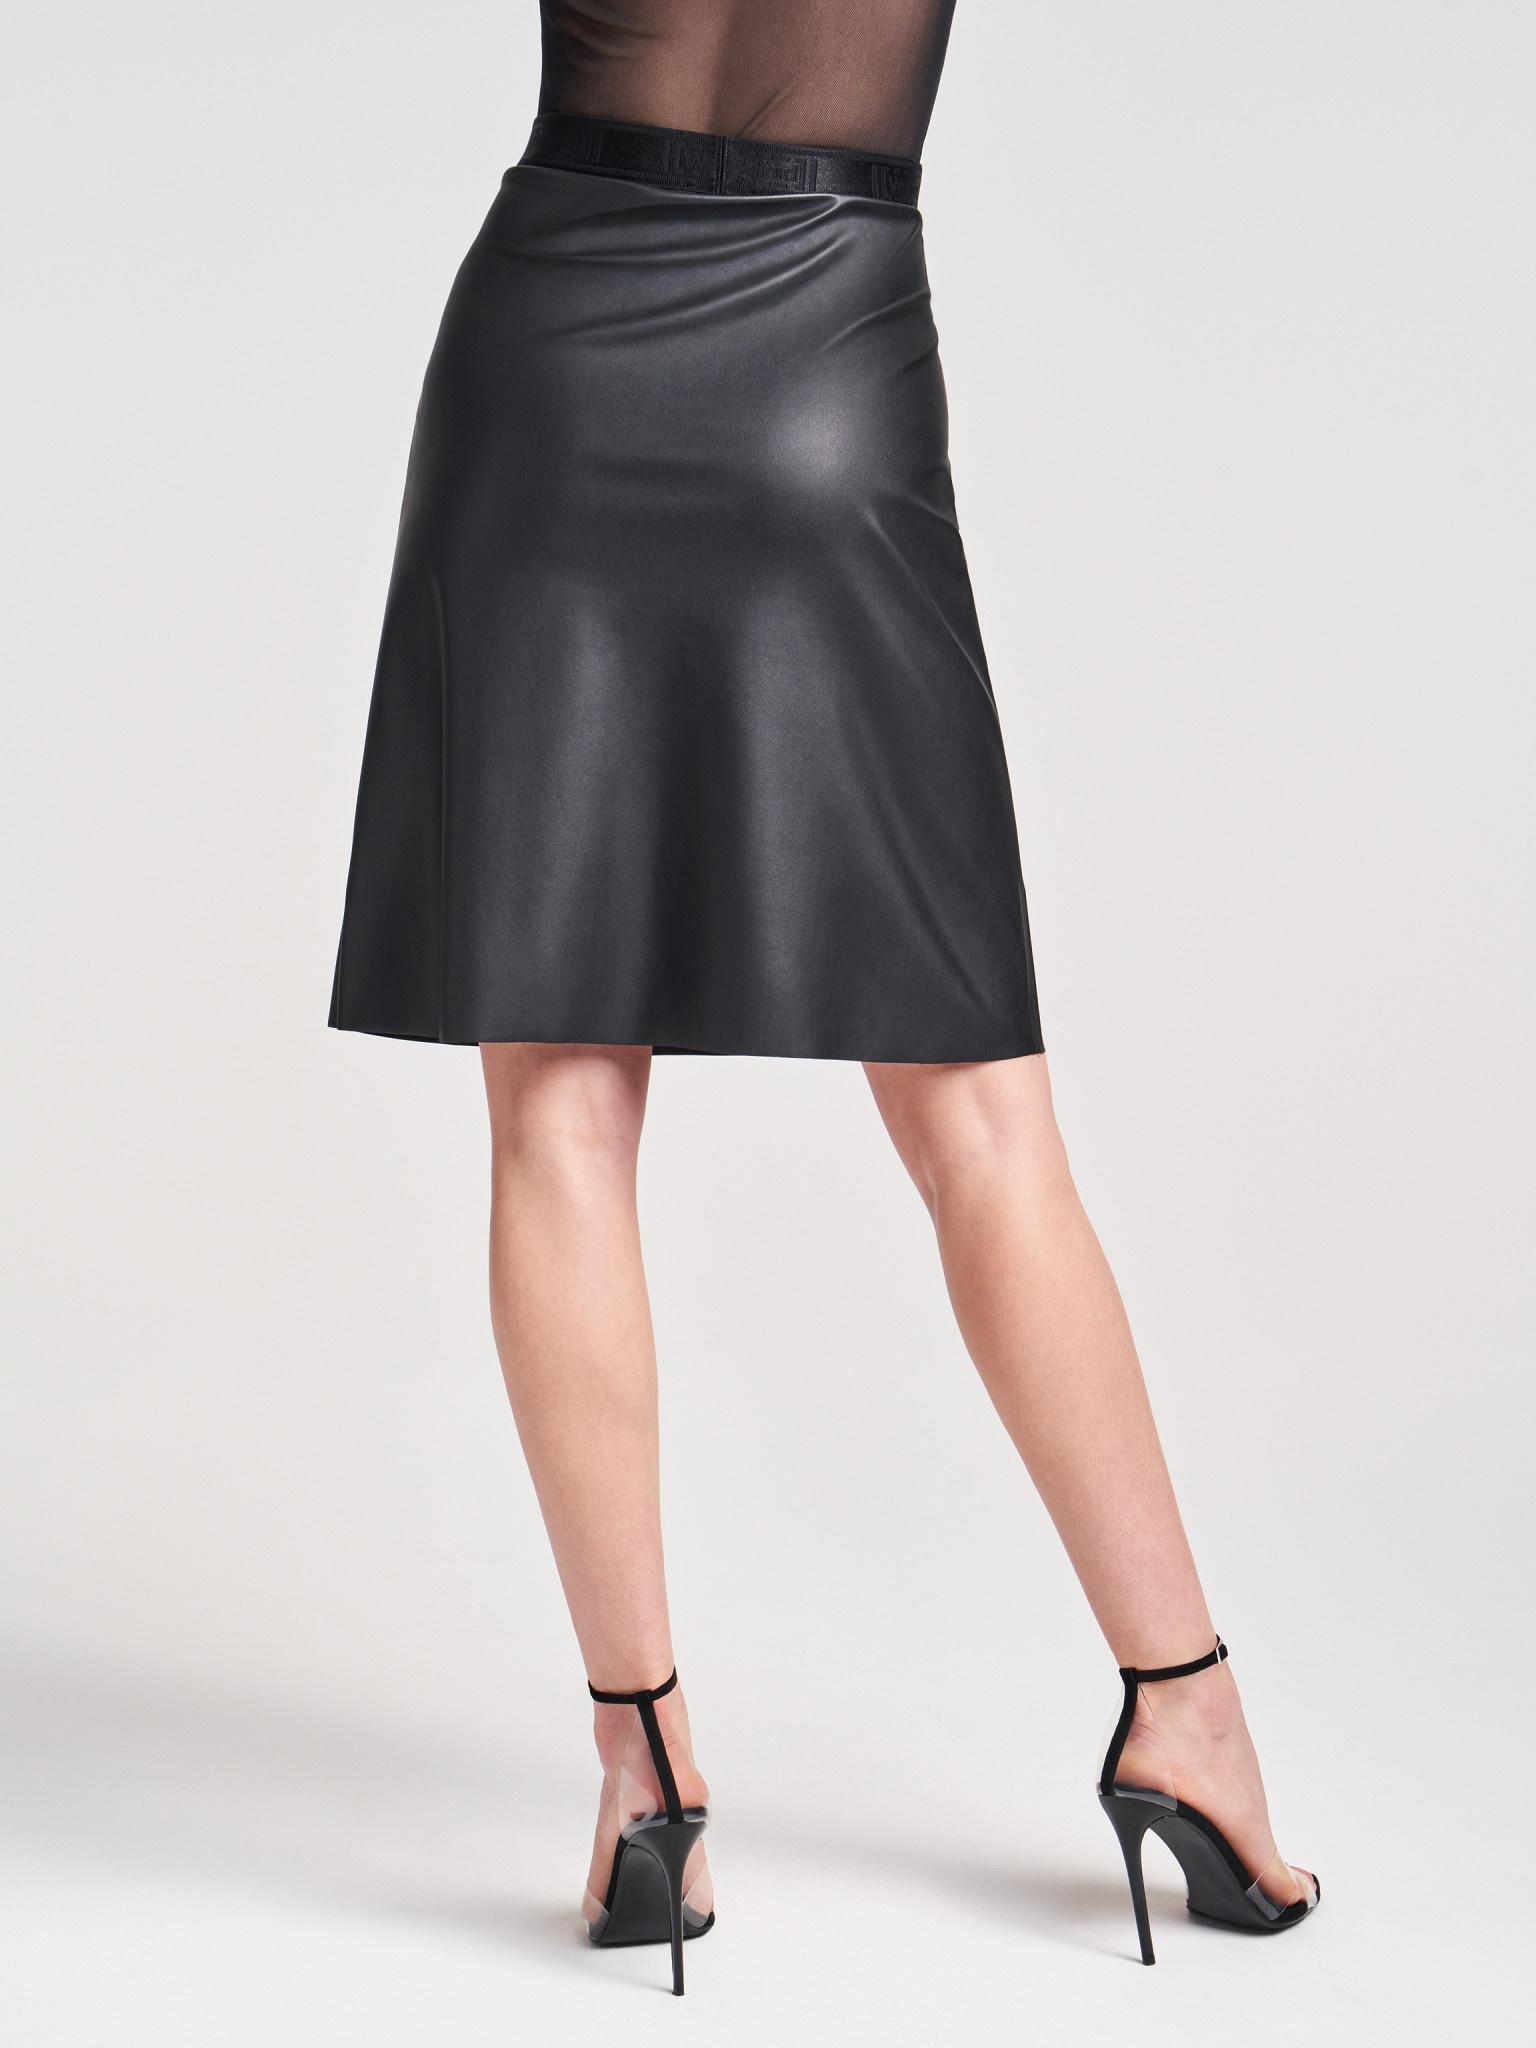 WOLFORD 52711 Estella Skirt